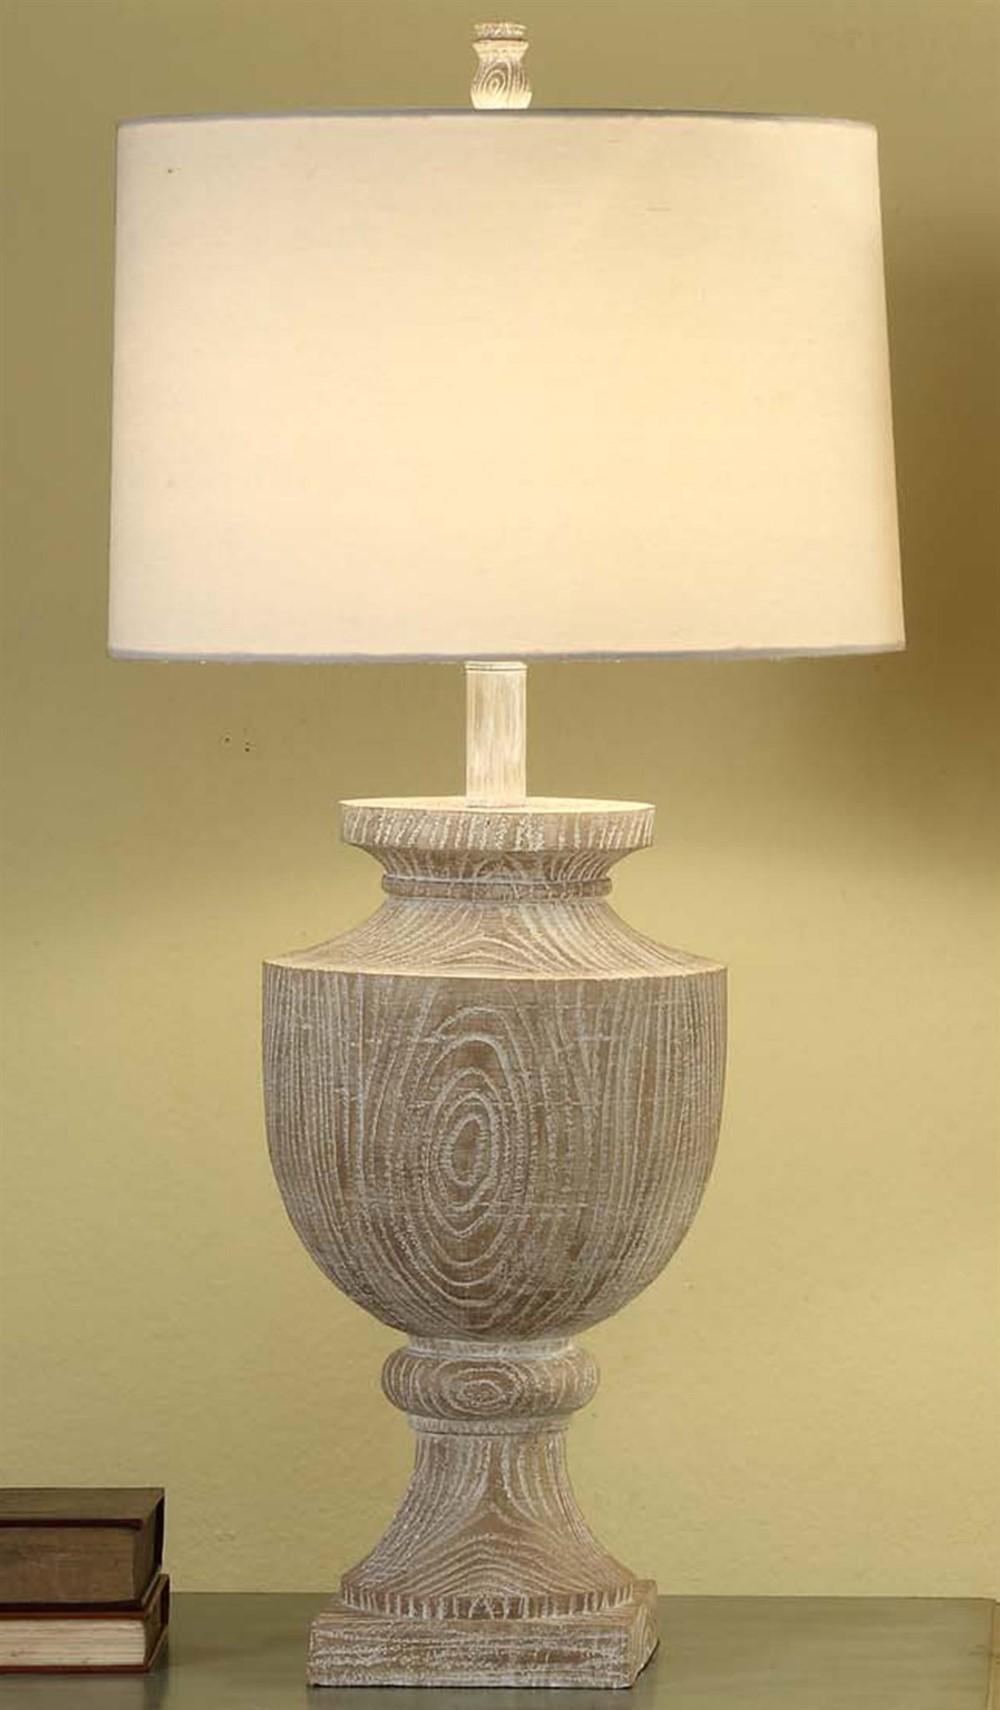 two bleached wood finished resin table lamps off white linen shade desk lights ebay. Black Bedroom Furniture Sets. Home Design Ideas